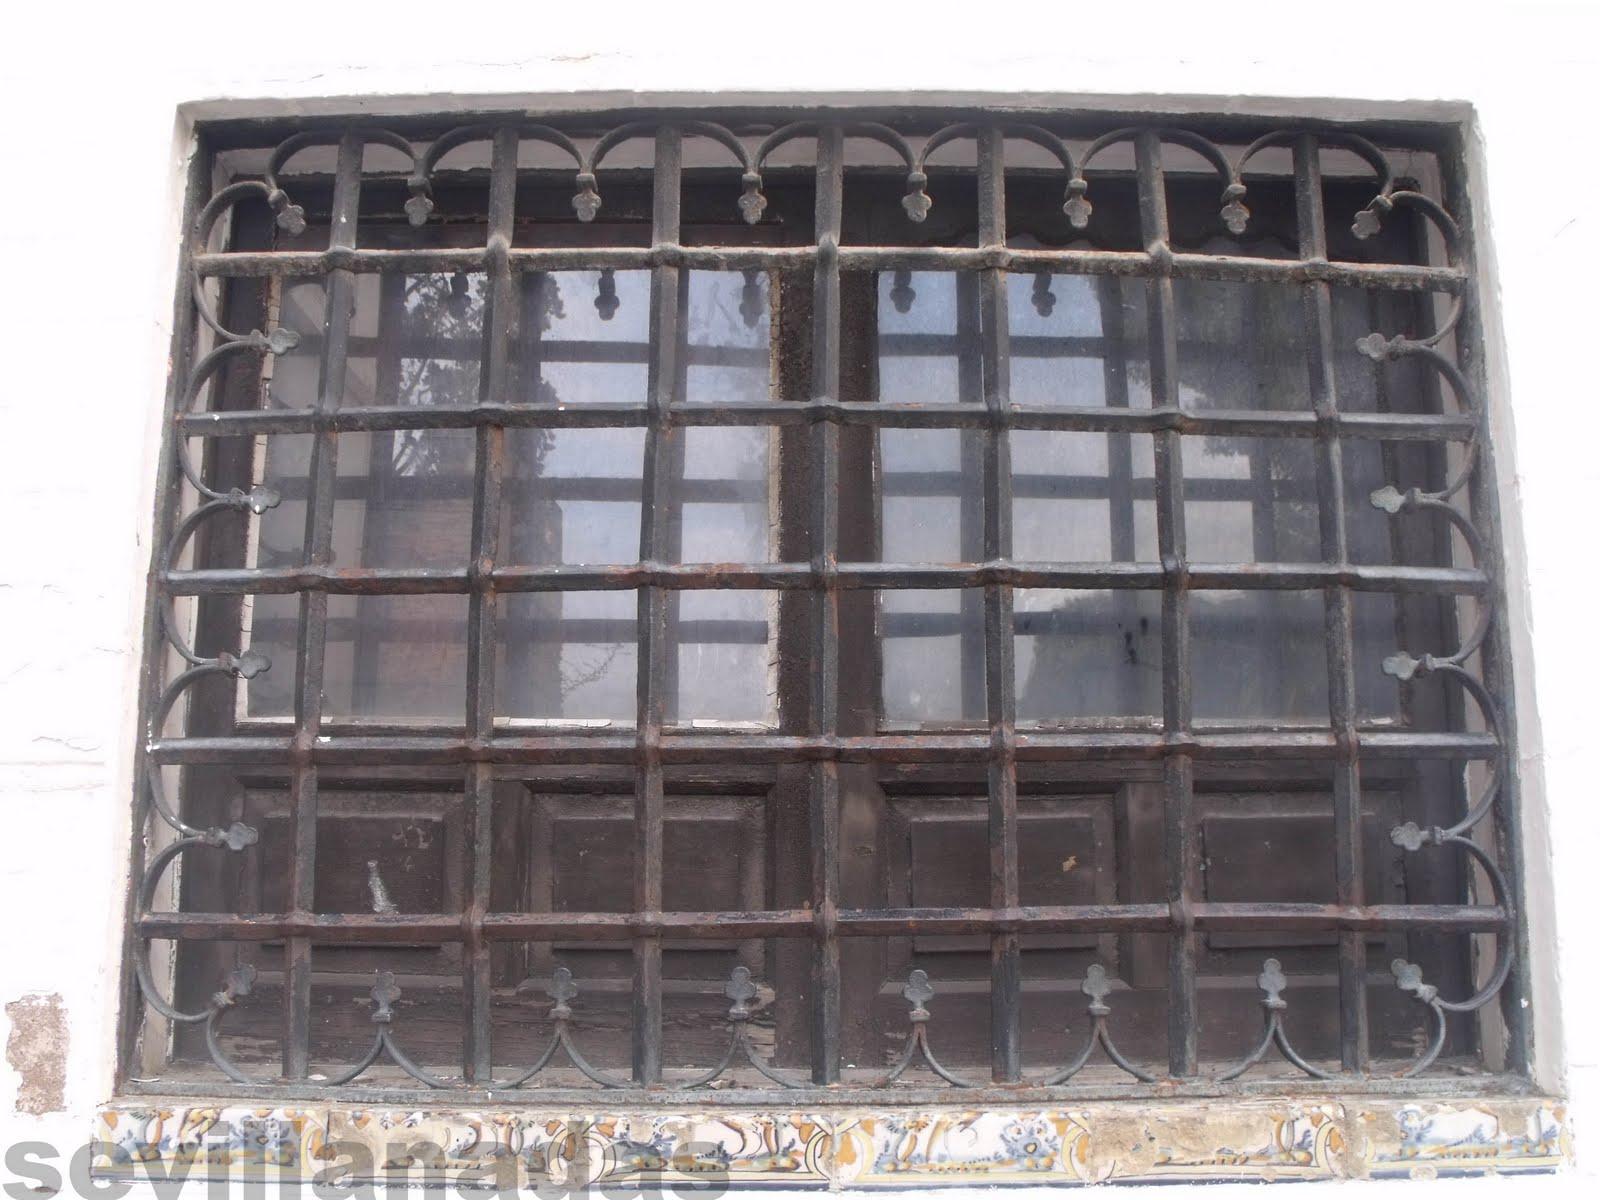 Rejas ventanas sevilla materiales de construcci n para la reparaci n - Materiales de construccion sevilla ...